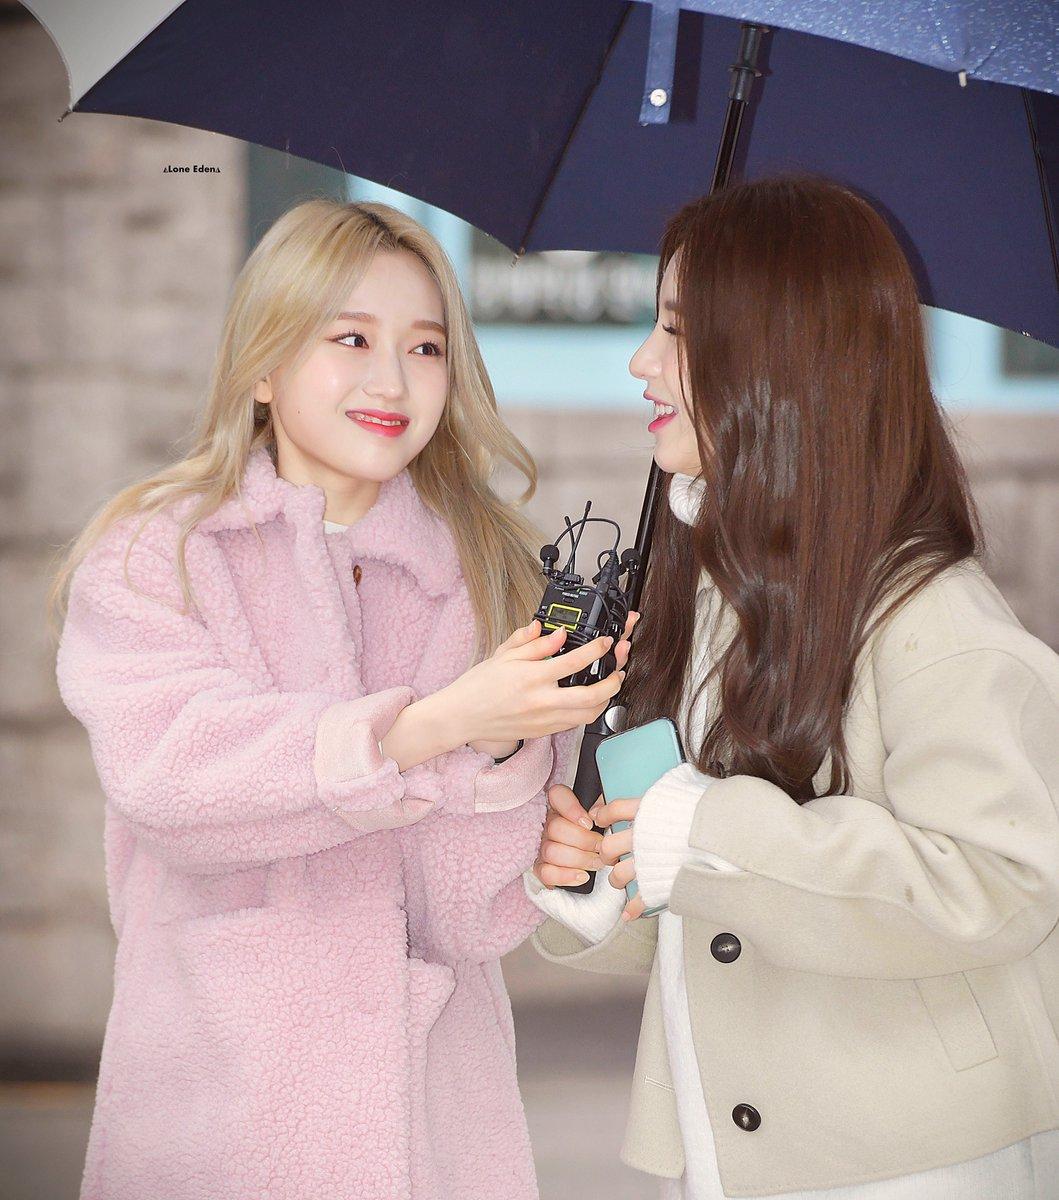 200107 happiness burns warmer than fire #고원 #Gowon #희진 #Heejin #이달의소녀 #LOONA<br>http://pic.twitter.com/3zYuvMuTYt